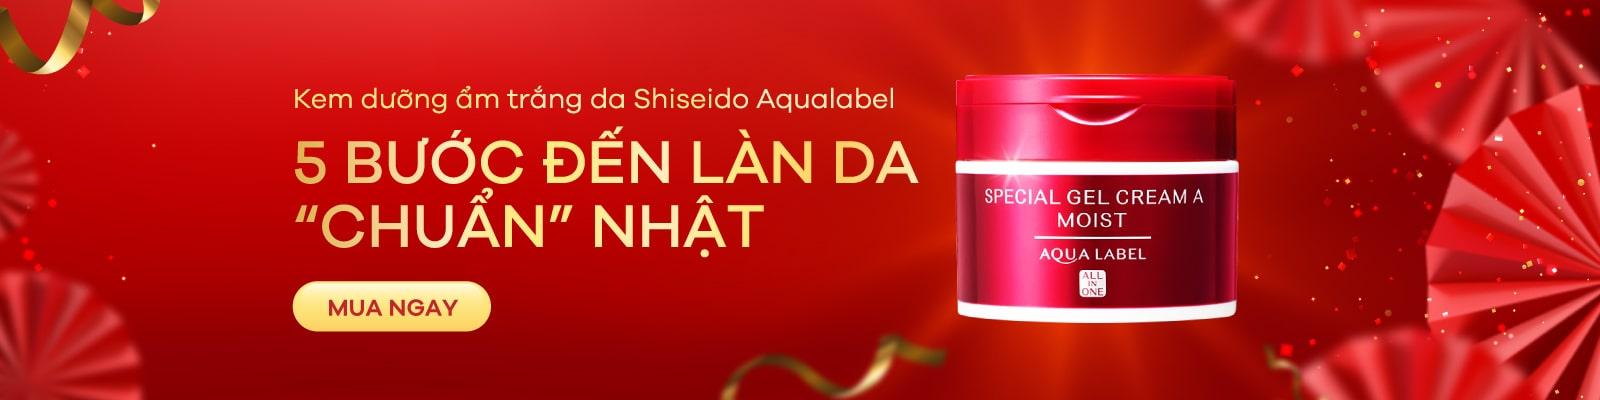 Kem dưỡng ẩm trắng da Shiseido Aqualabel